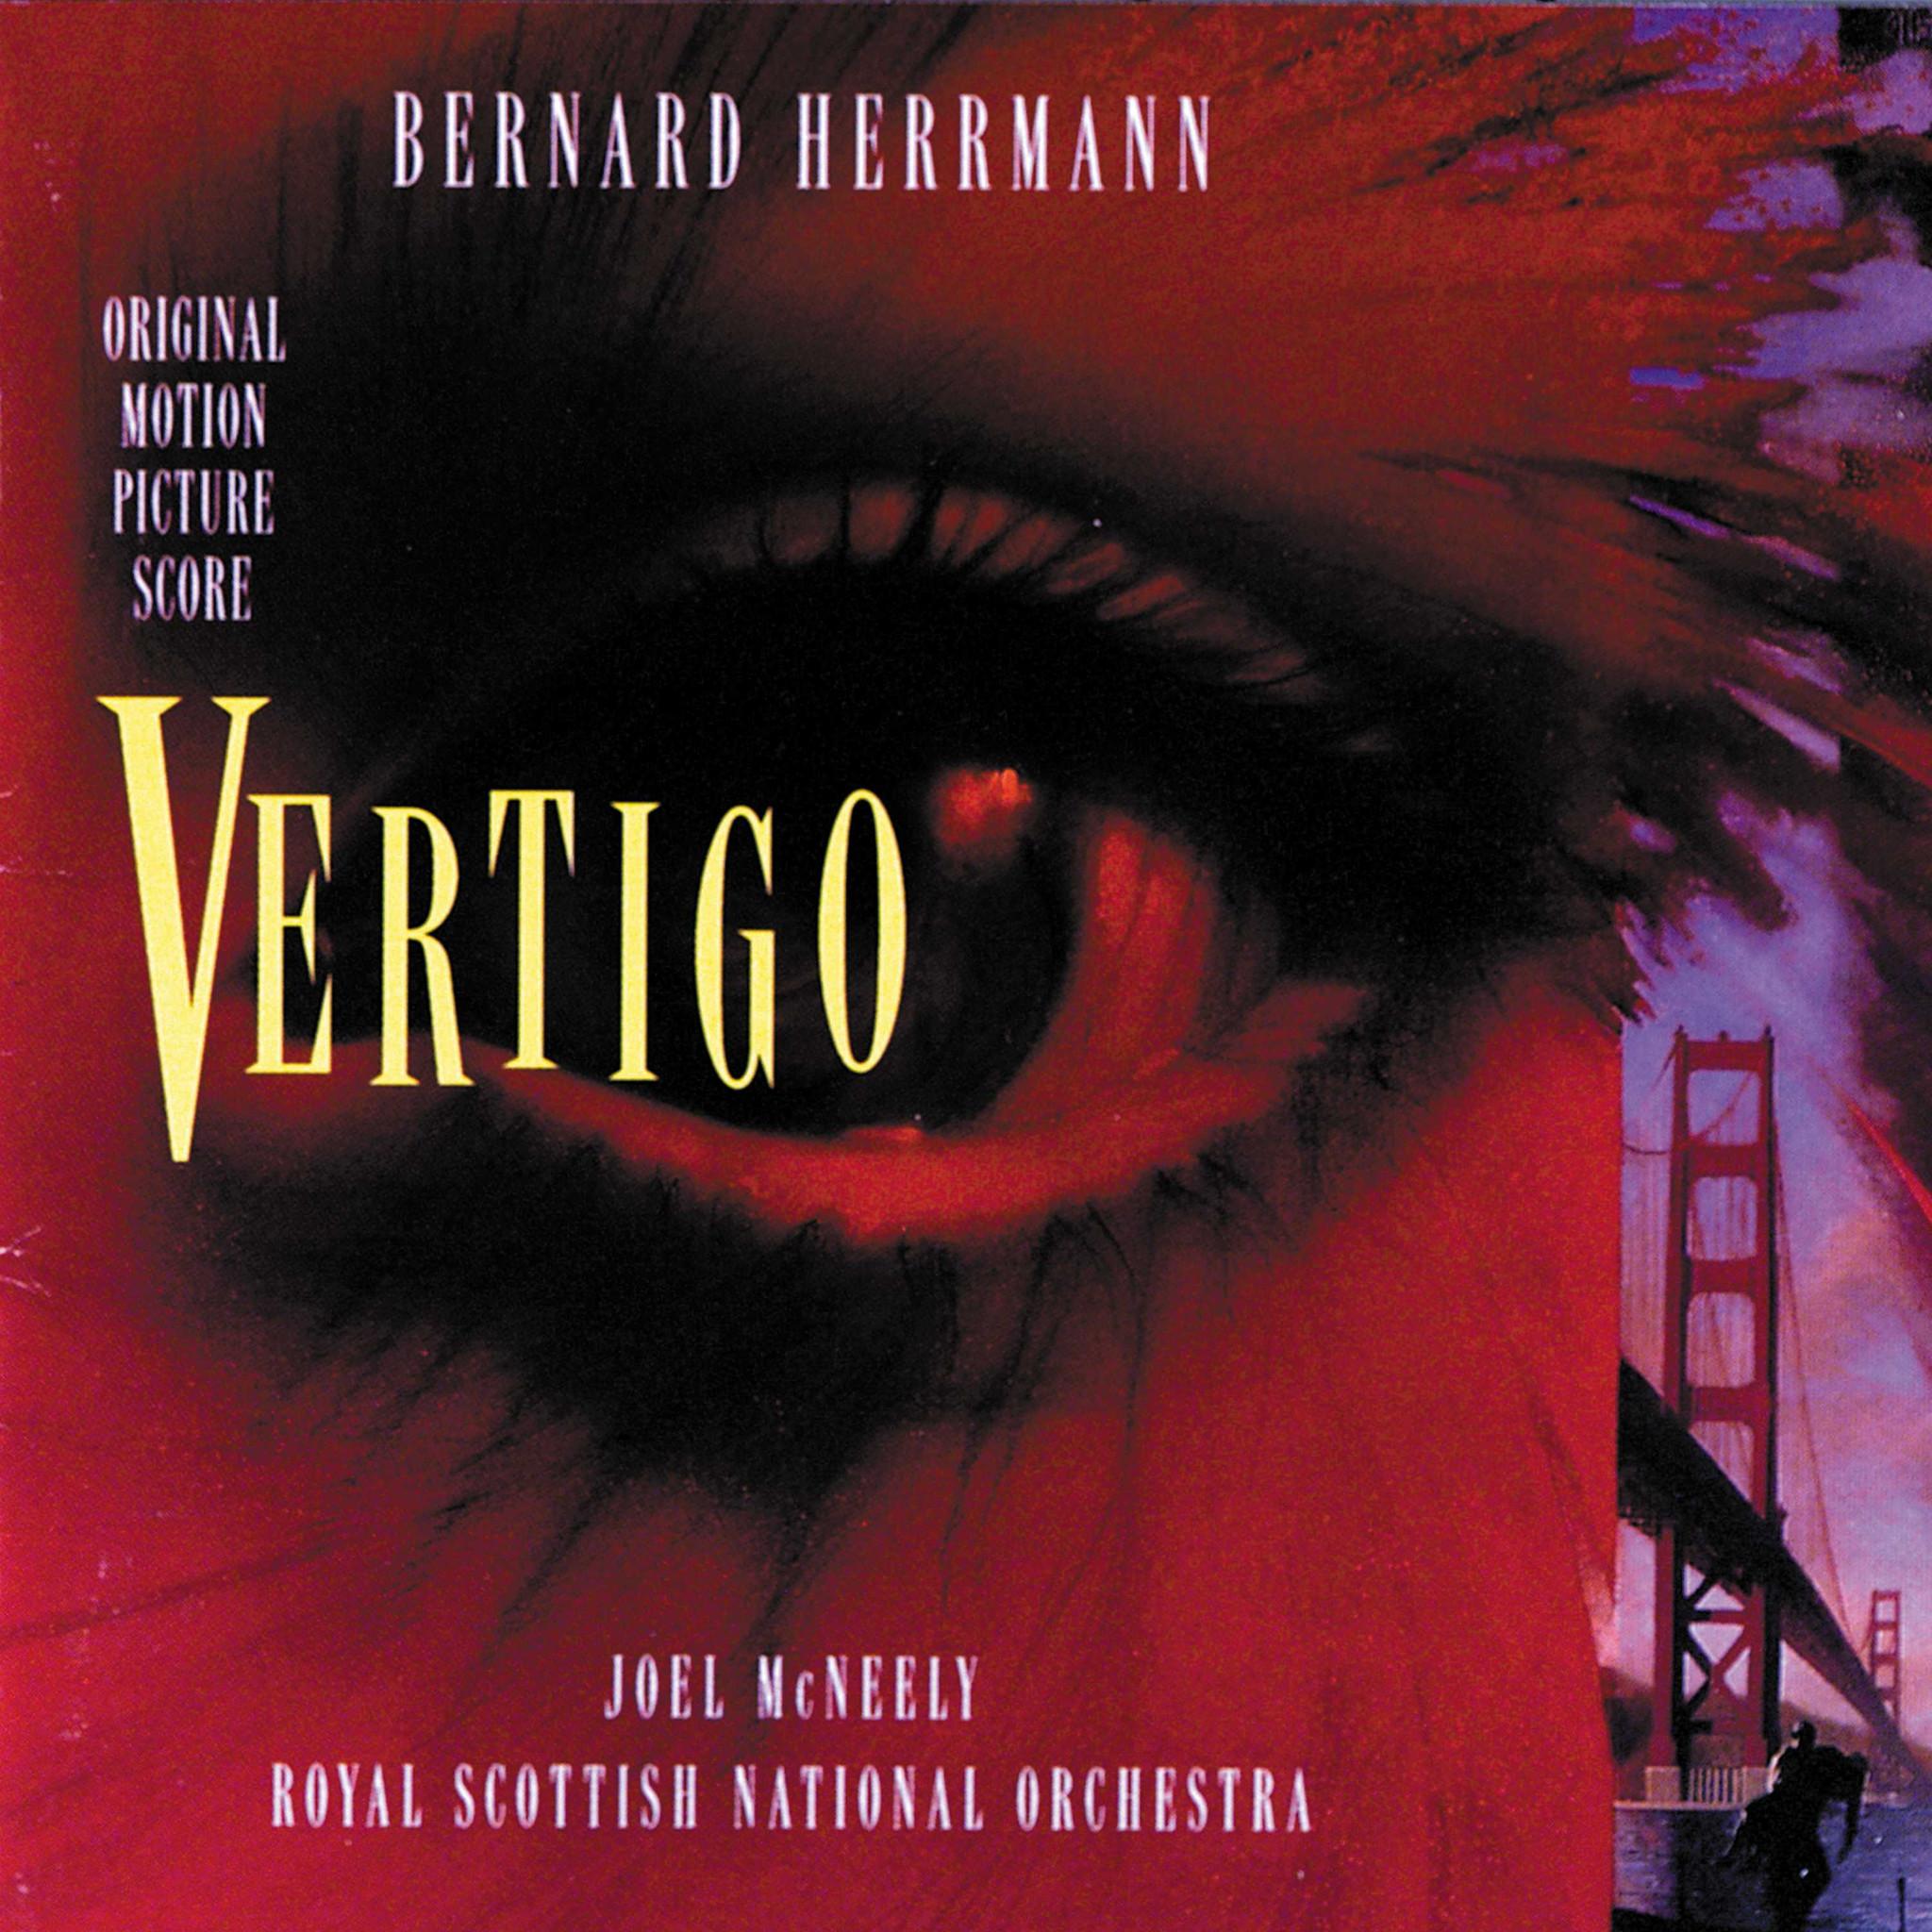 Vertigo (1995 Re-recording) - BERNARD HERRMANN & JOEL McNEELY / OST - Musik - SOUNDTRACK/SCORE - 0030206560022 - November 16, 2019